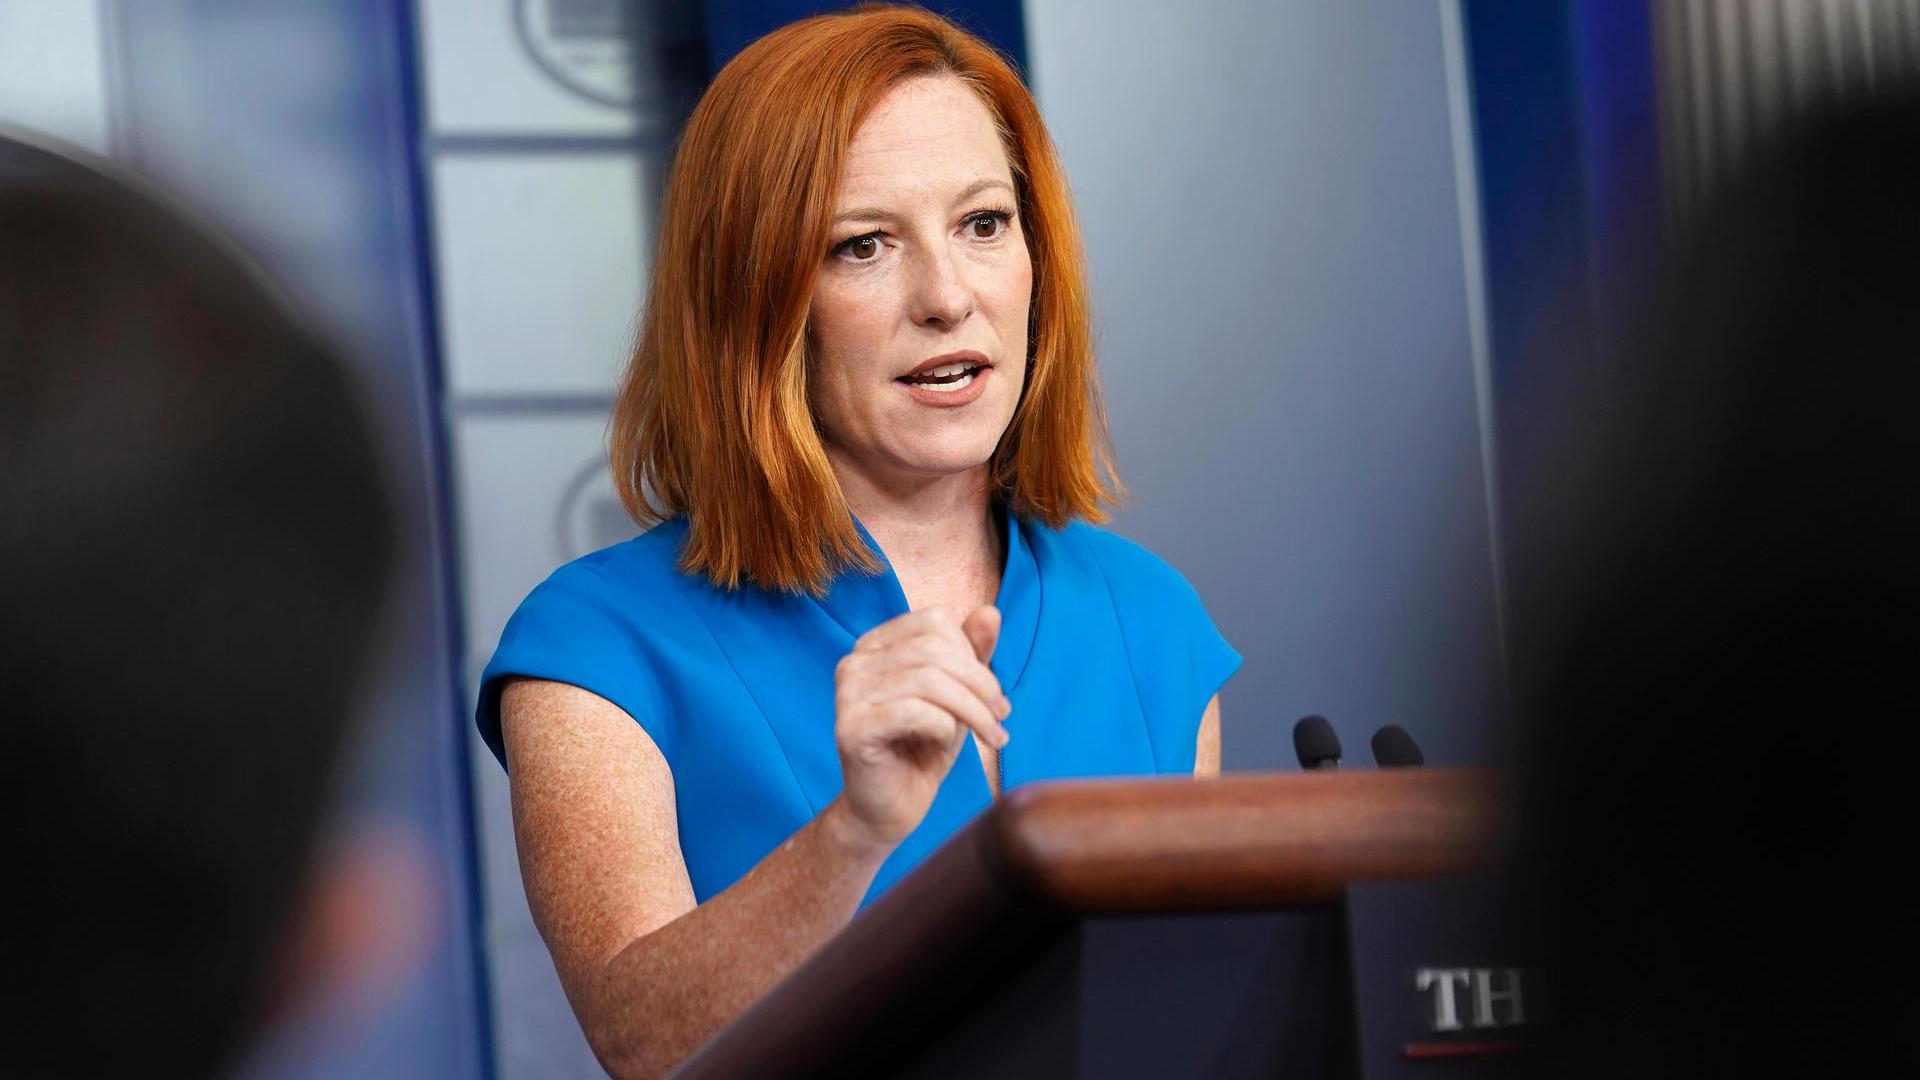 Biden spokeswoman Jen Psaki reprimanded reporters over questions about abortion